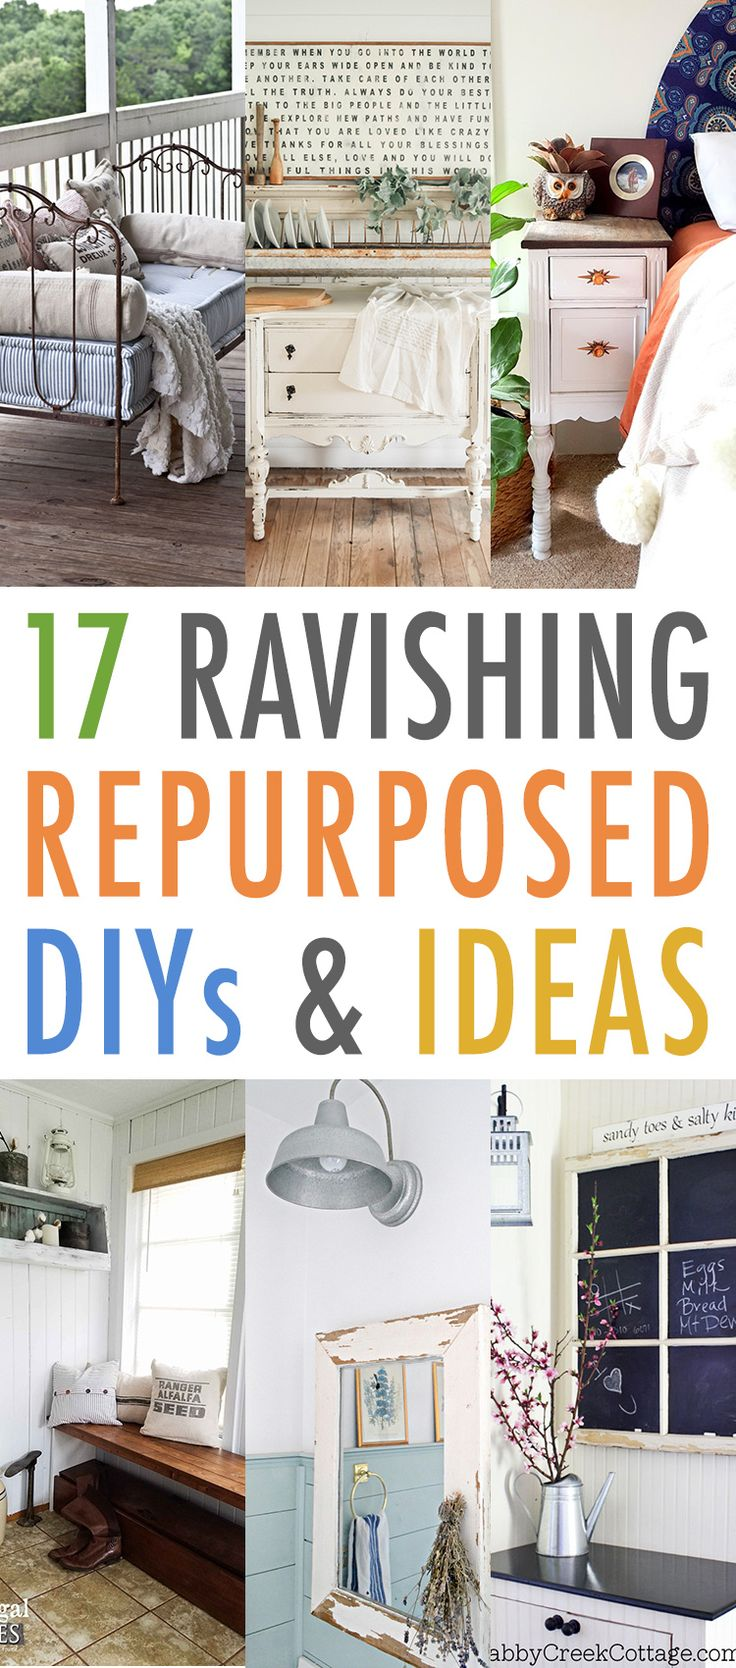 17 Ravishing Repurposed DIYS and Ideas